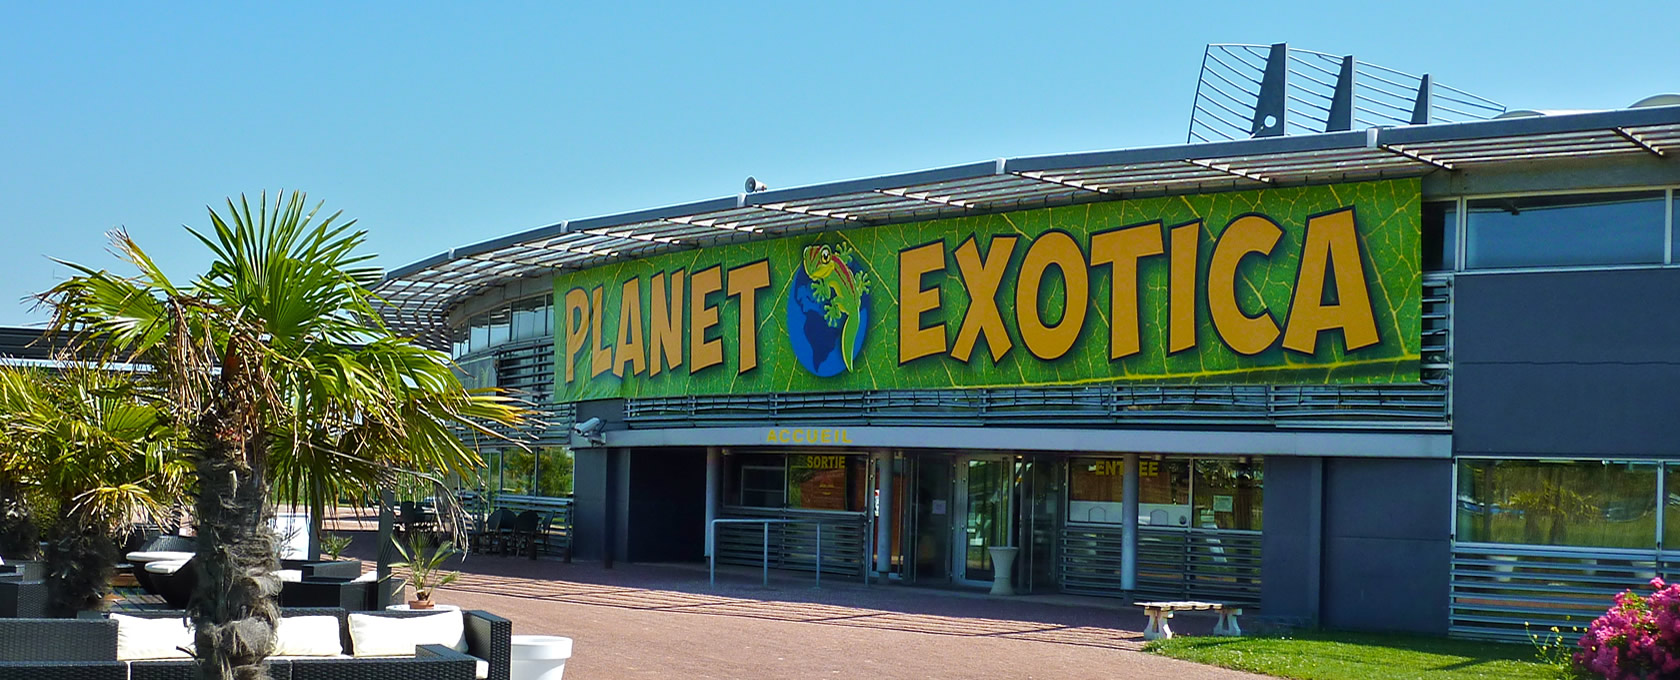 Infos pratiques Planet Exotica